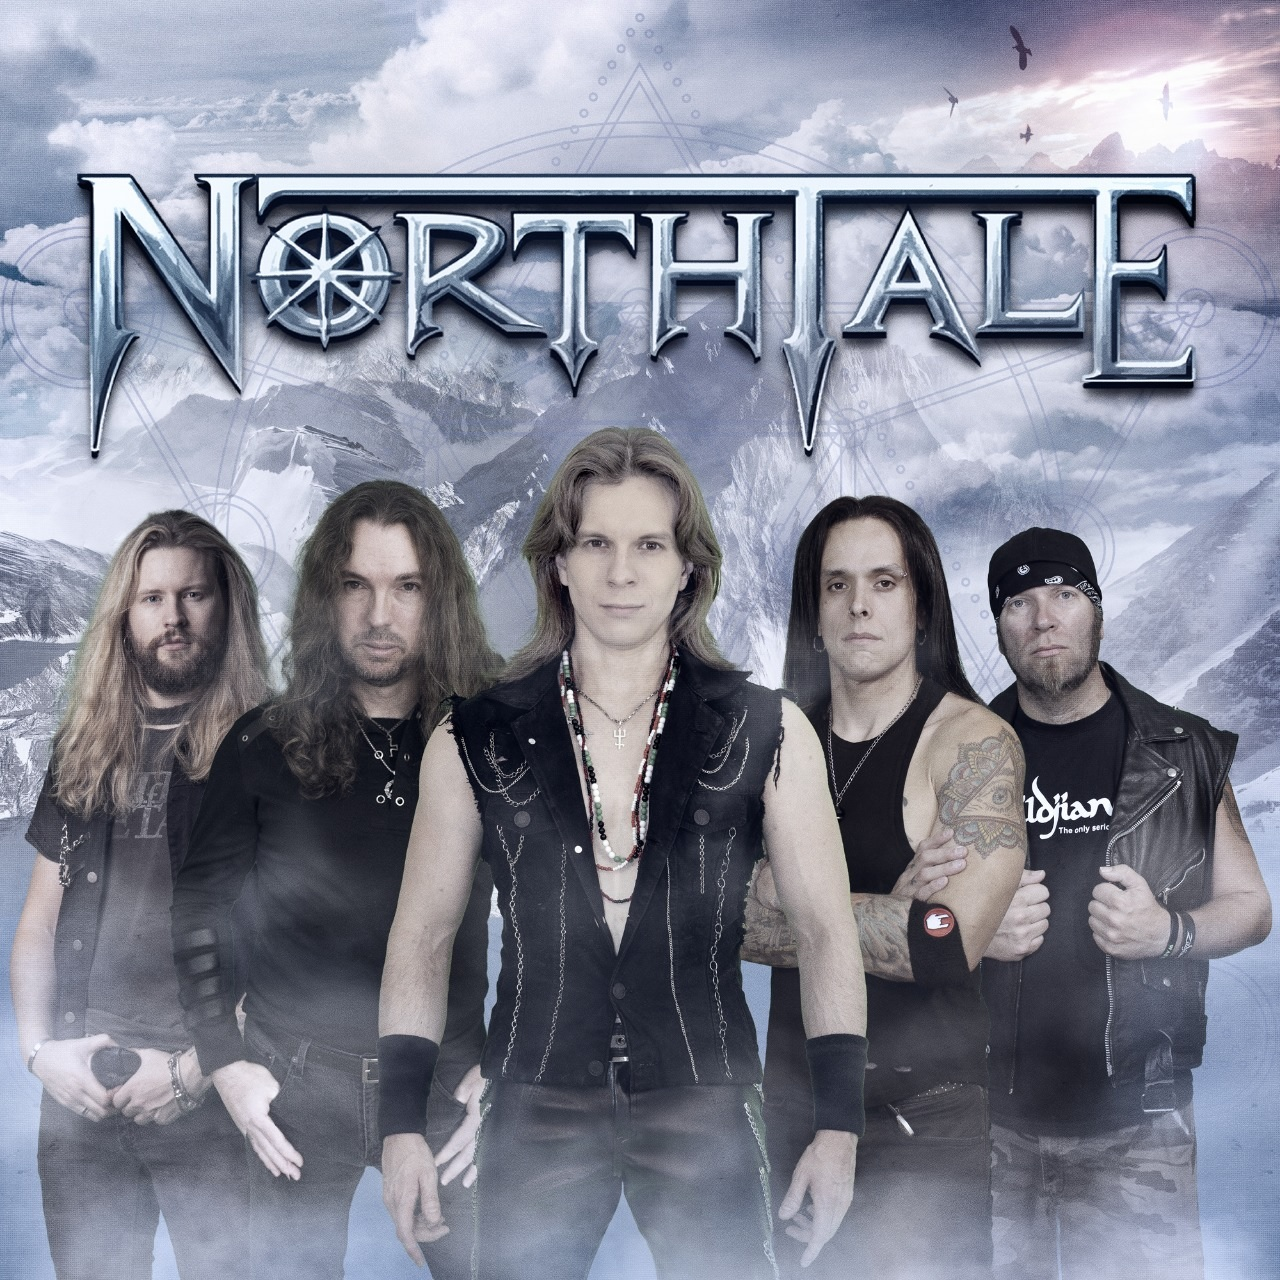 northtale pic 1